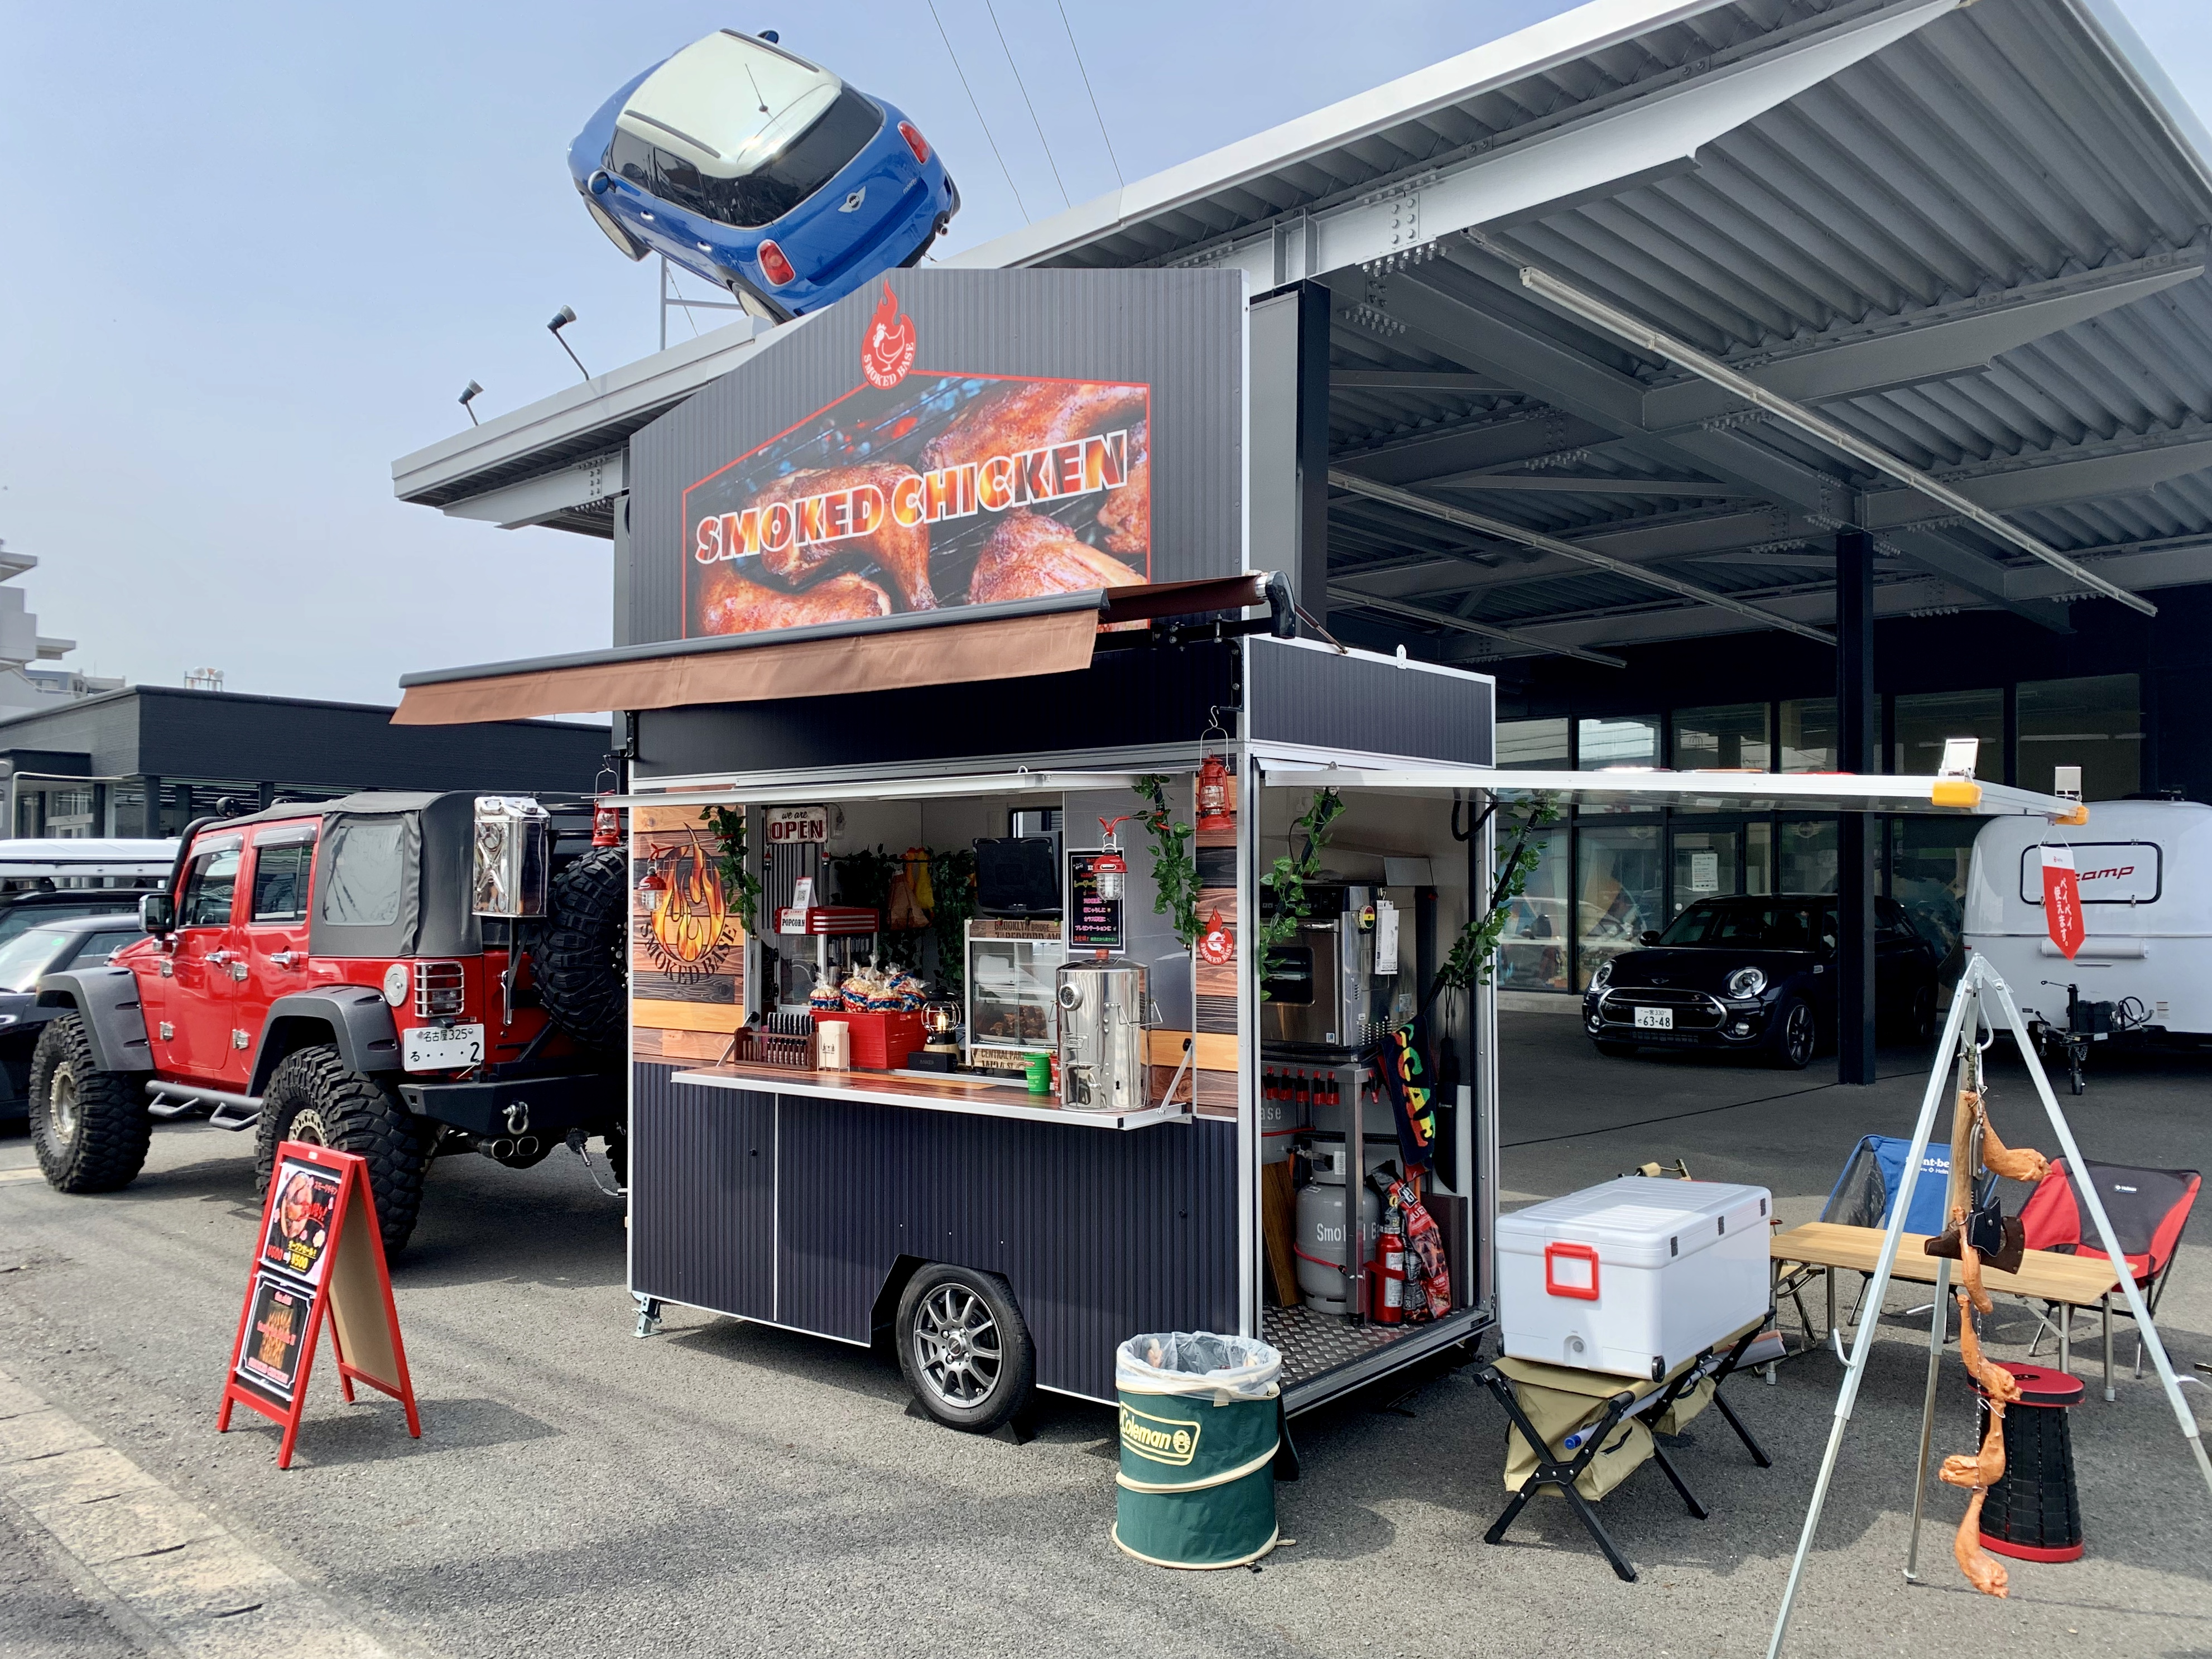 SMOKED BASE(スモークベイス),キッチンカー,フードトラック,出店,愛知,岐阜,スモークチキン